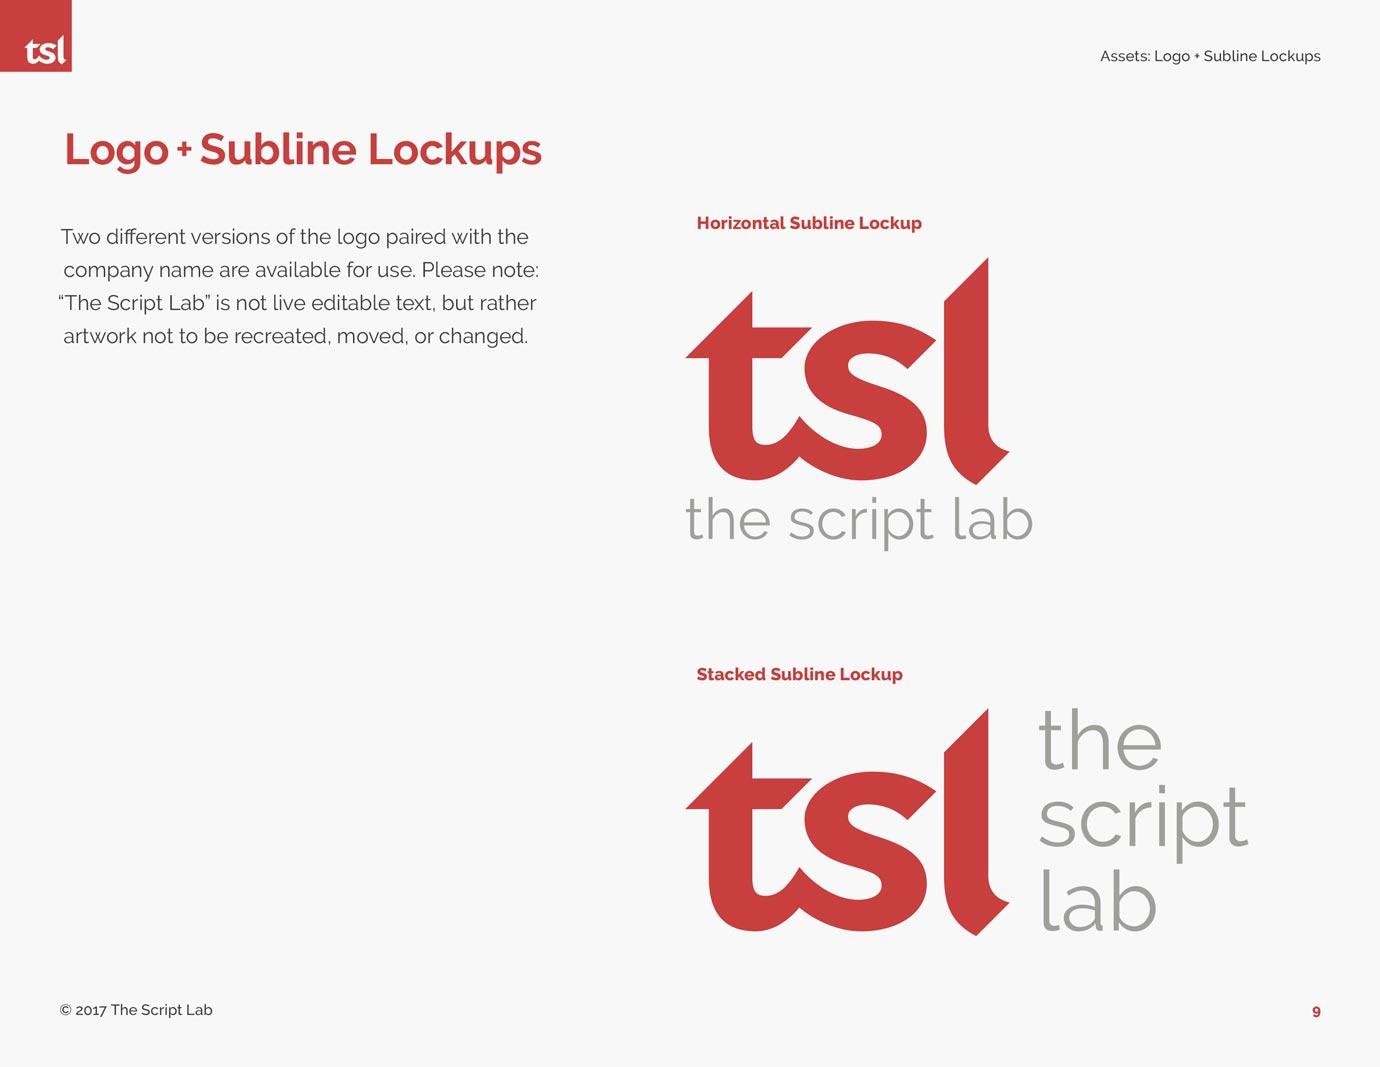 The Script Lab brand standards manual design